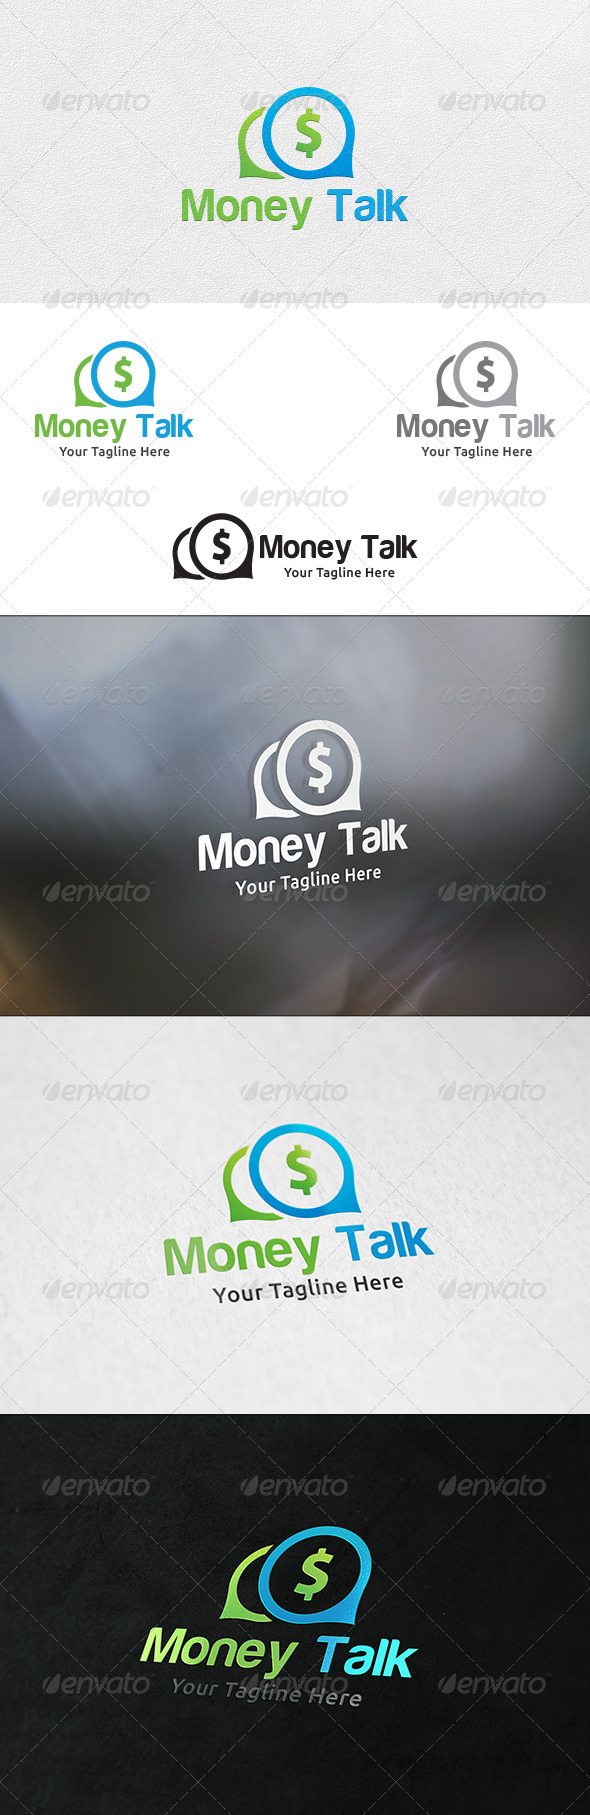 Money Talk Logo Template